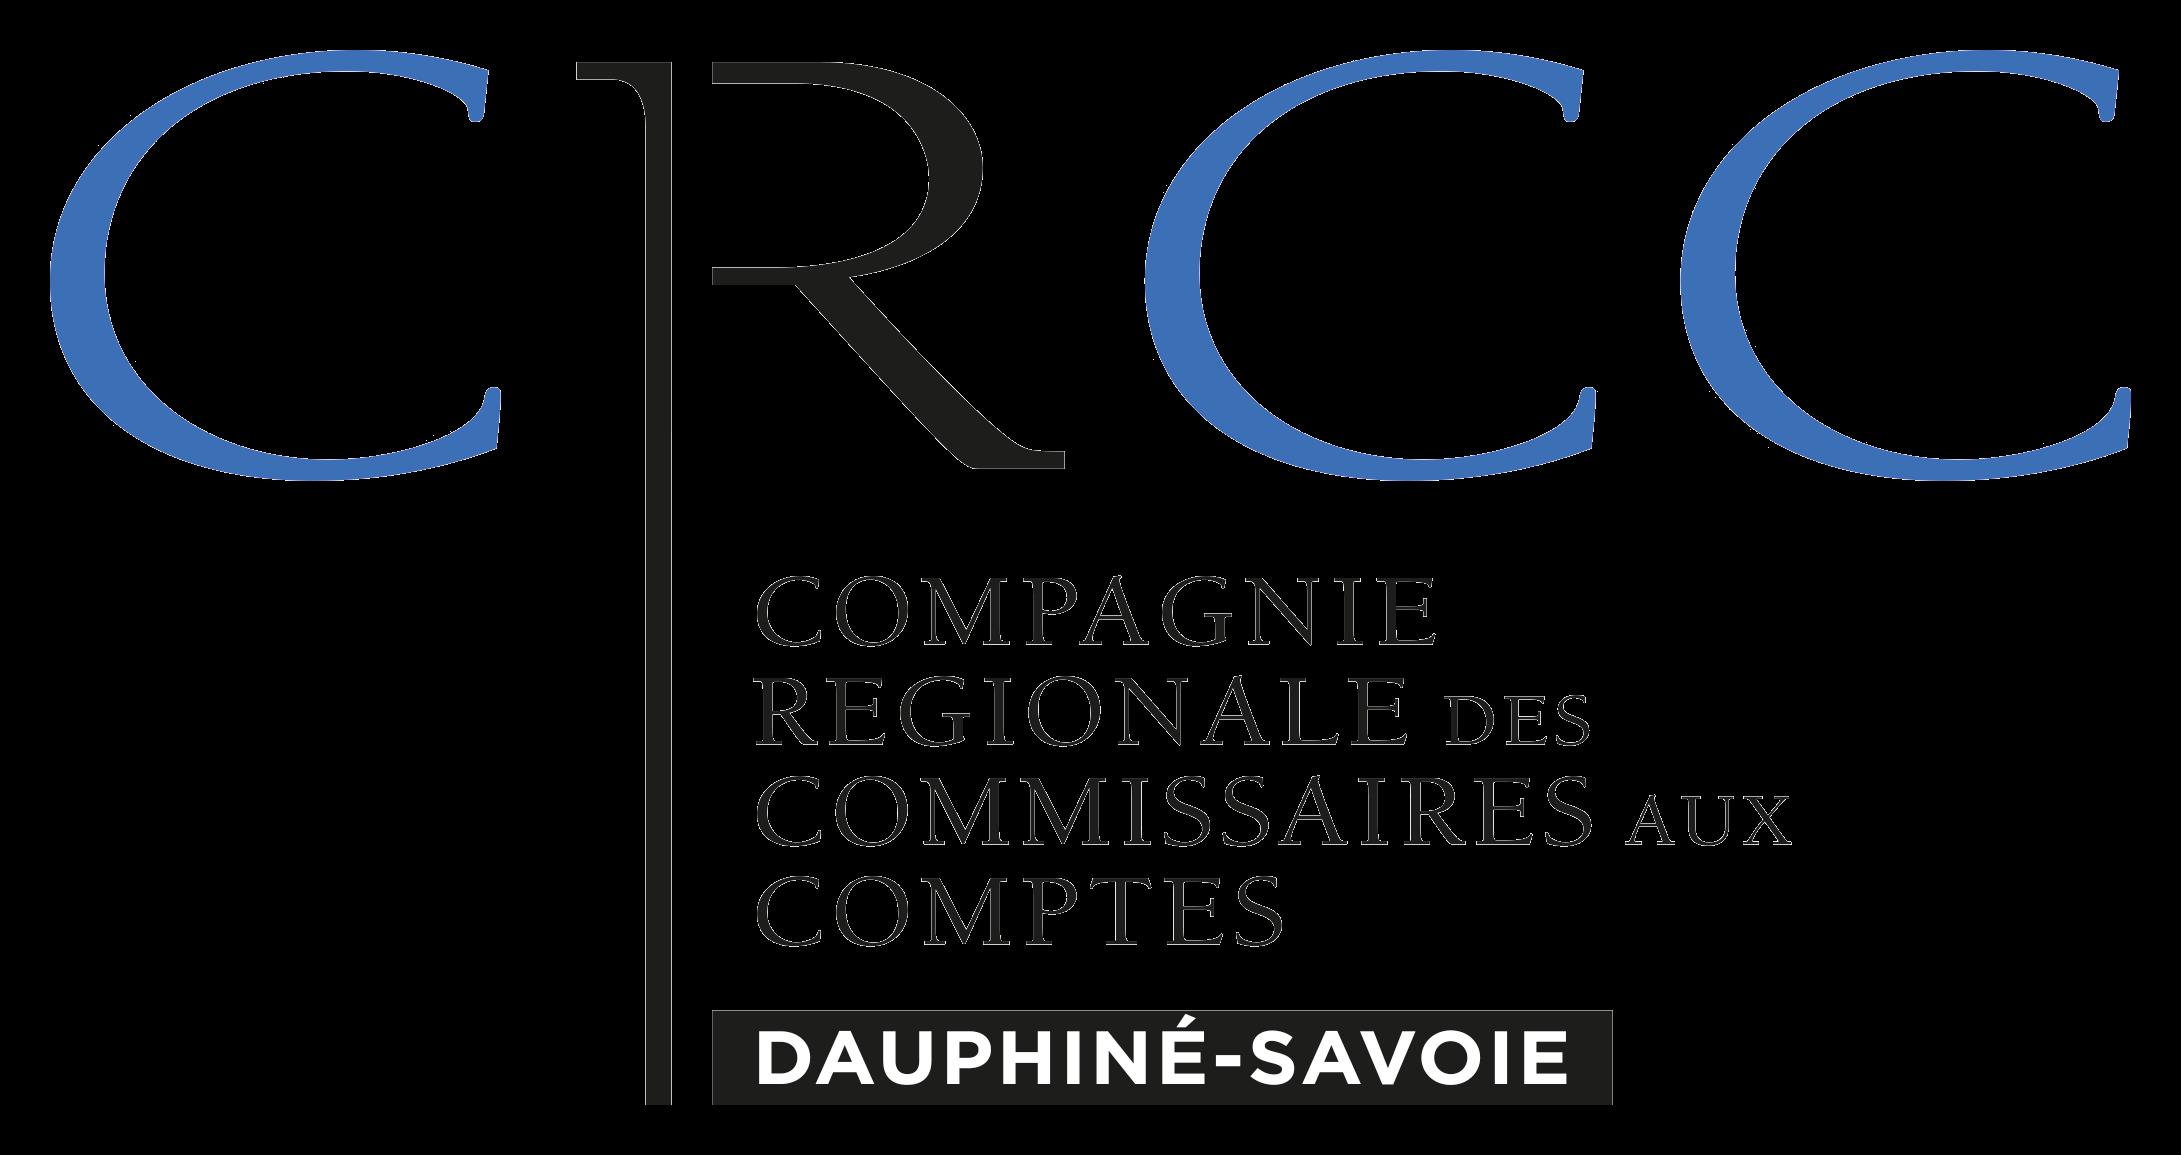 CRCC_Dauphine Savoie_300DPI